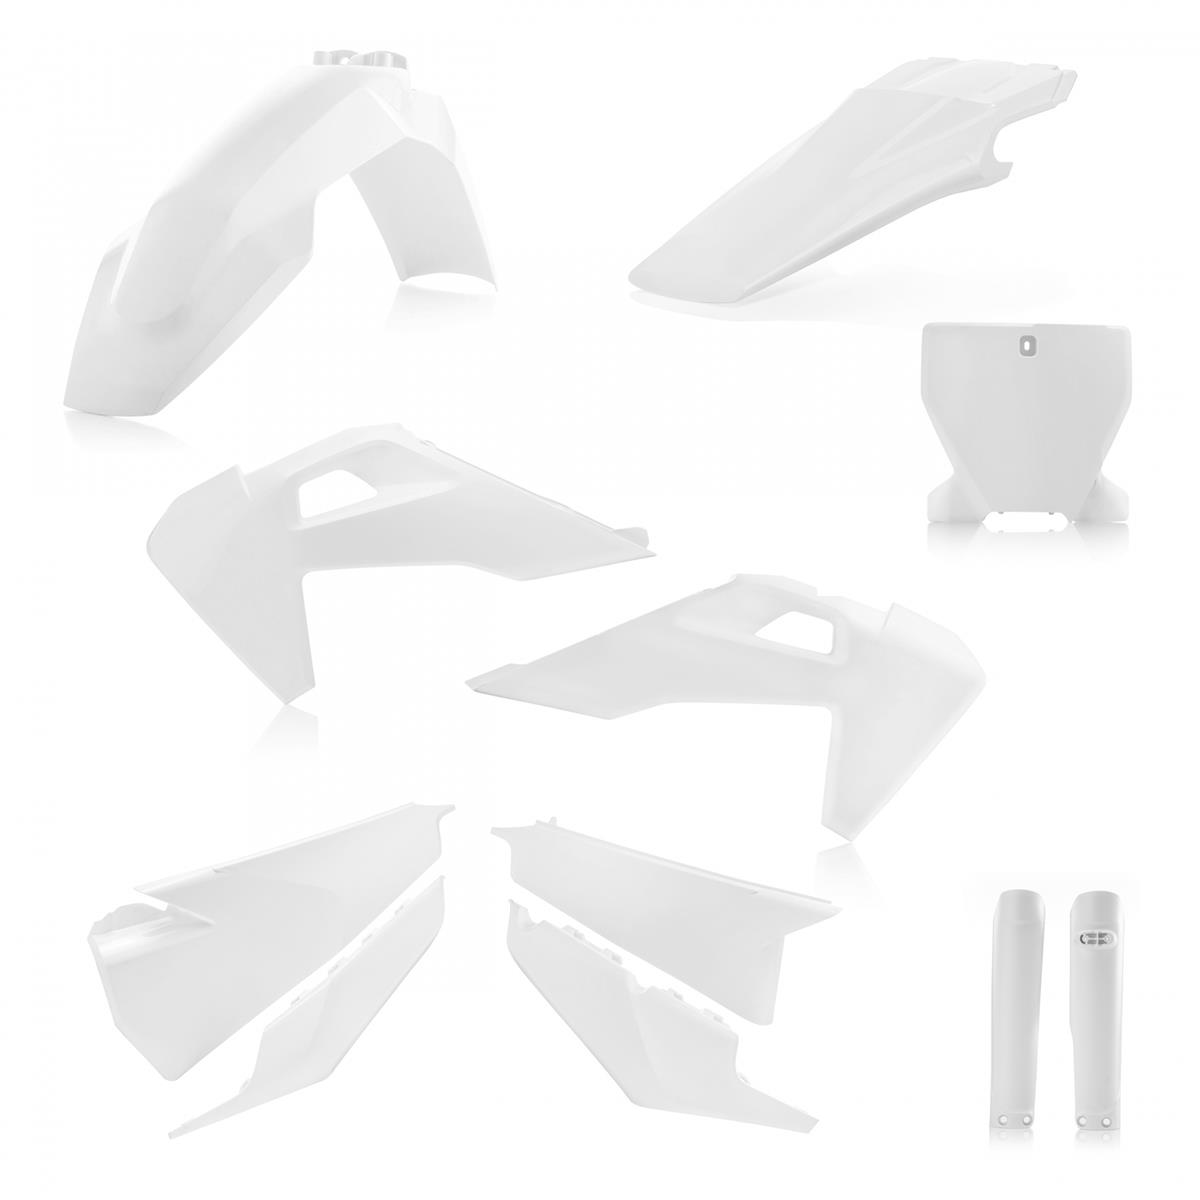 acerbis-plastik-kit-inkl-bremsscheibenschutz-plastic-kit-incl-brake-disk-protection-full-kit-1 (2)